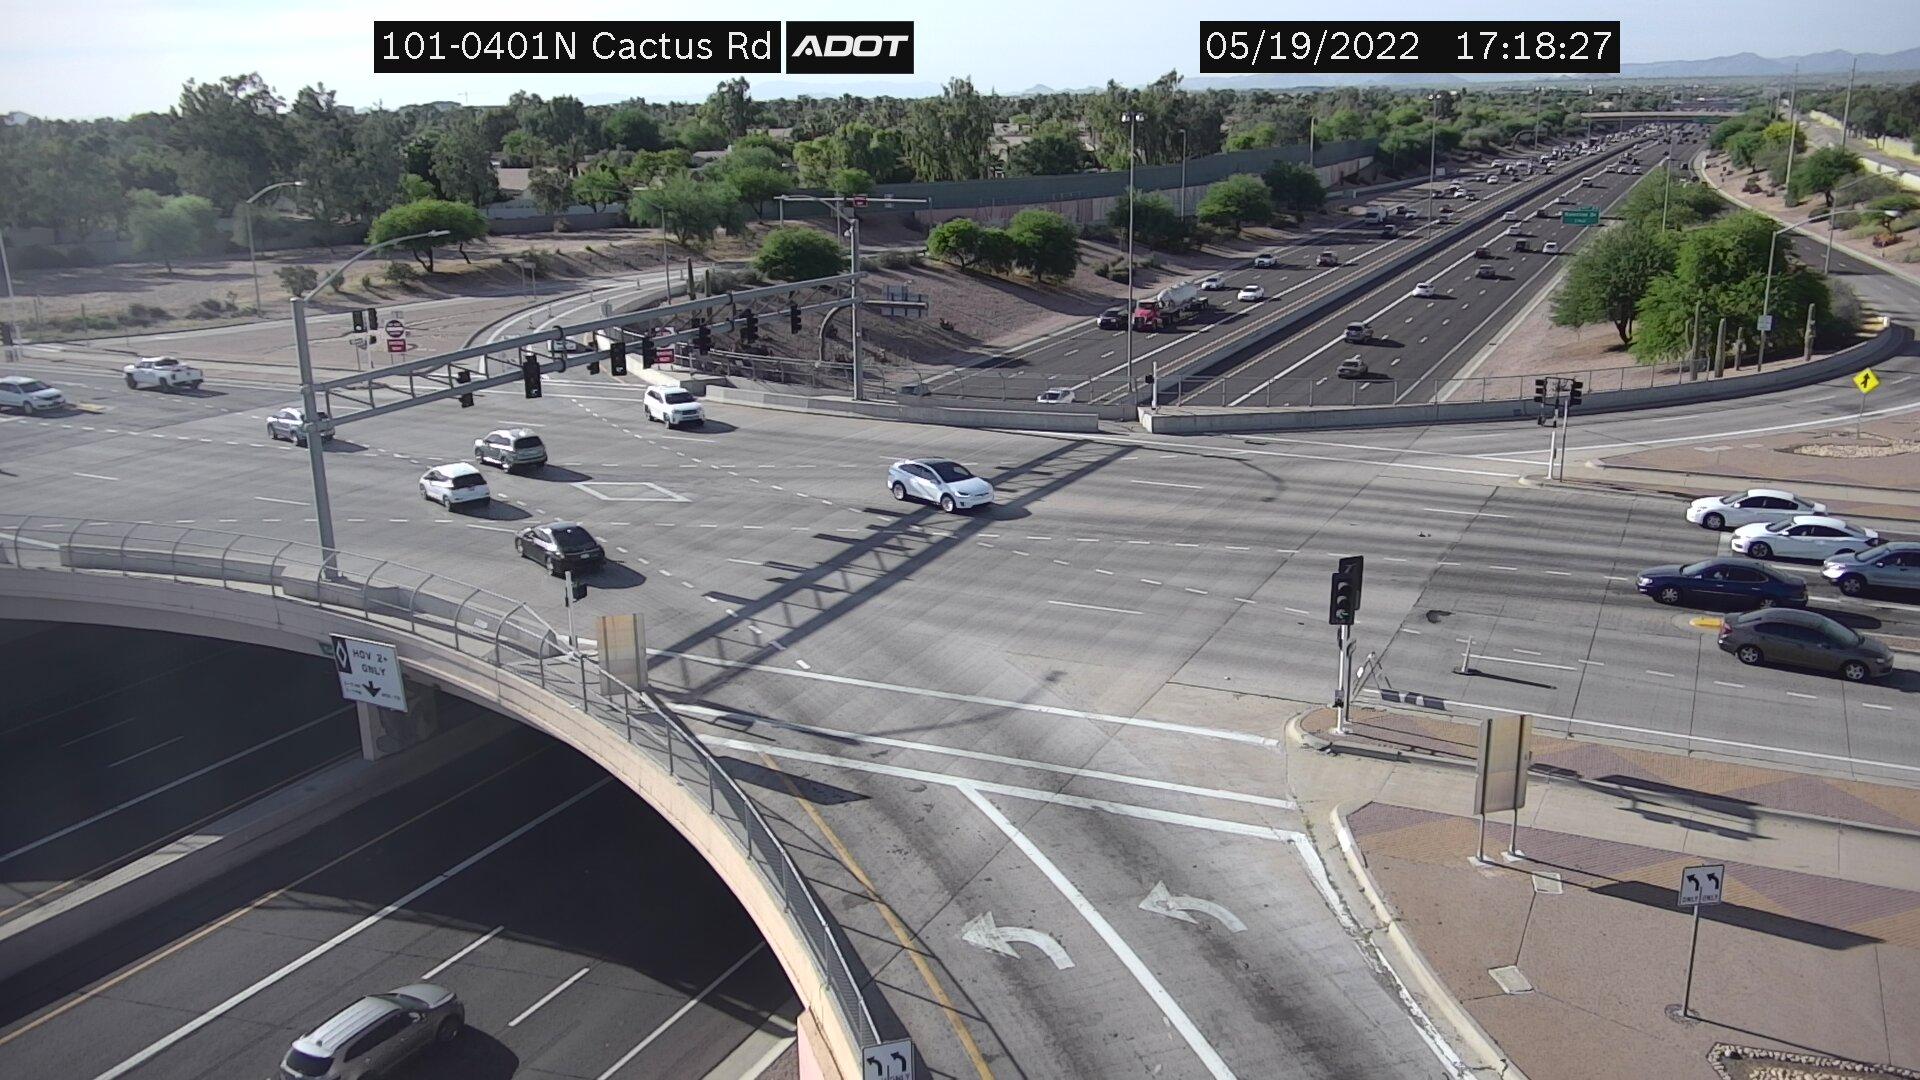 Cactus NB (L101) (132) - Phoenix and Arizona